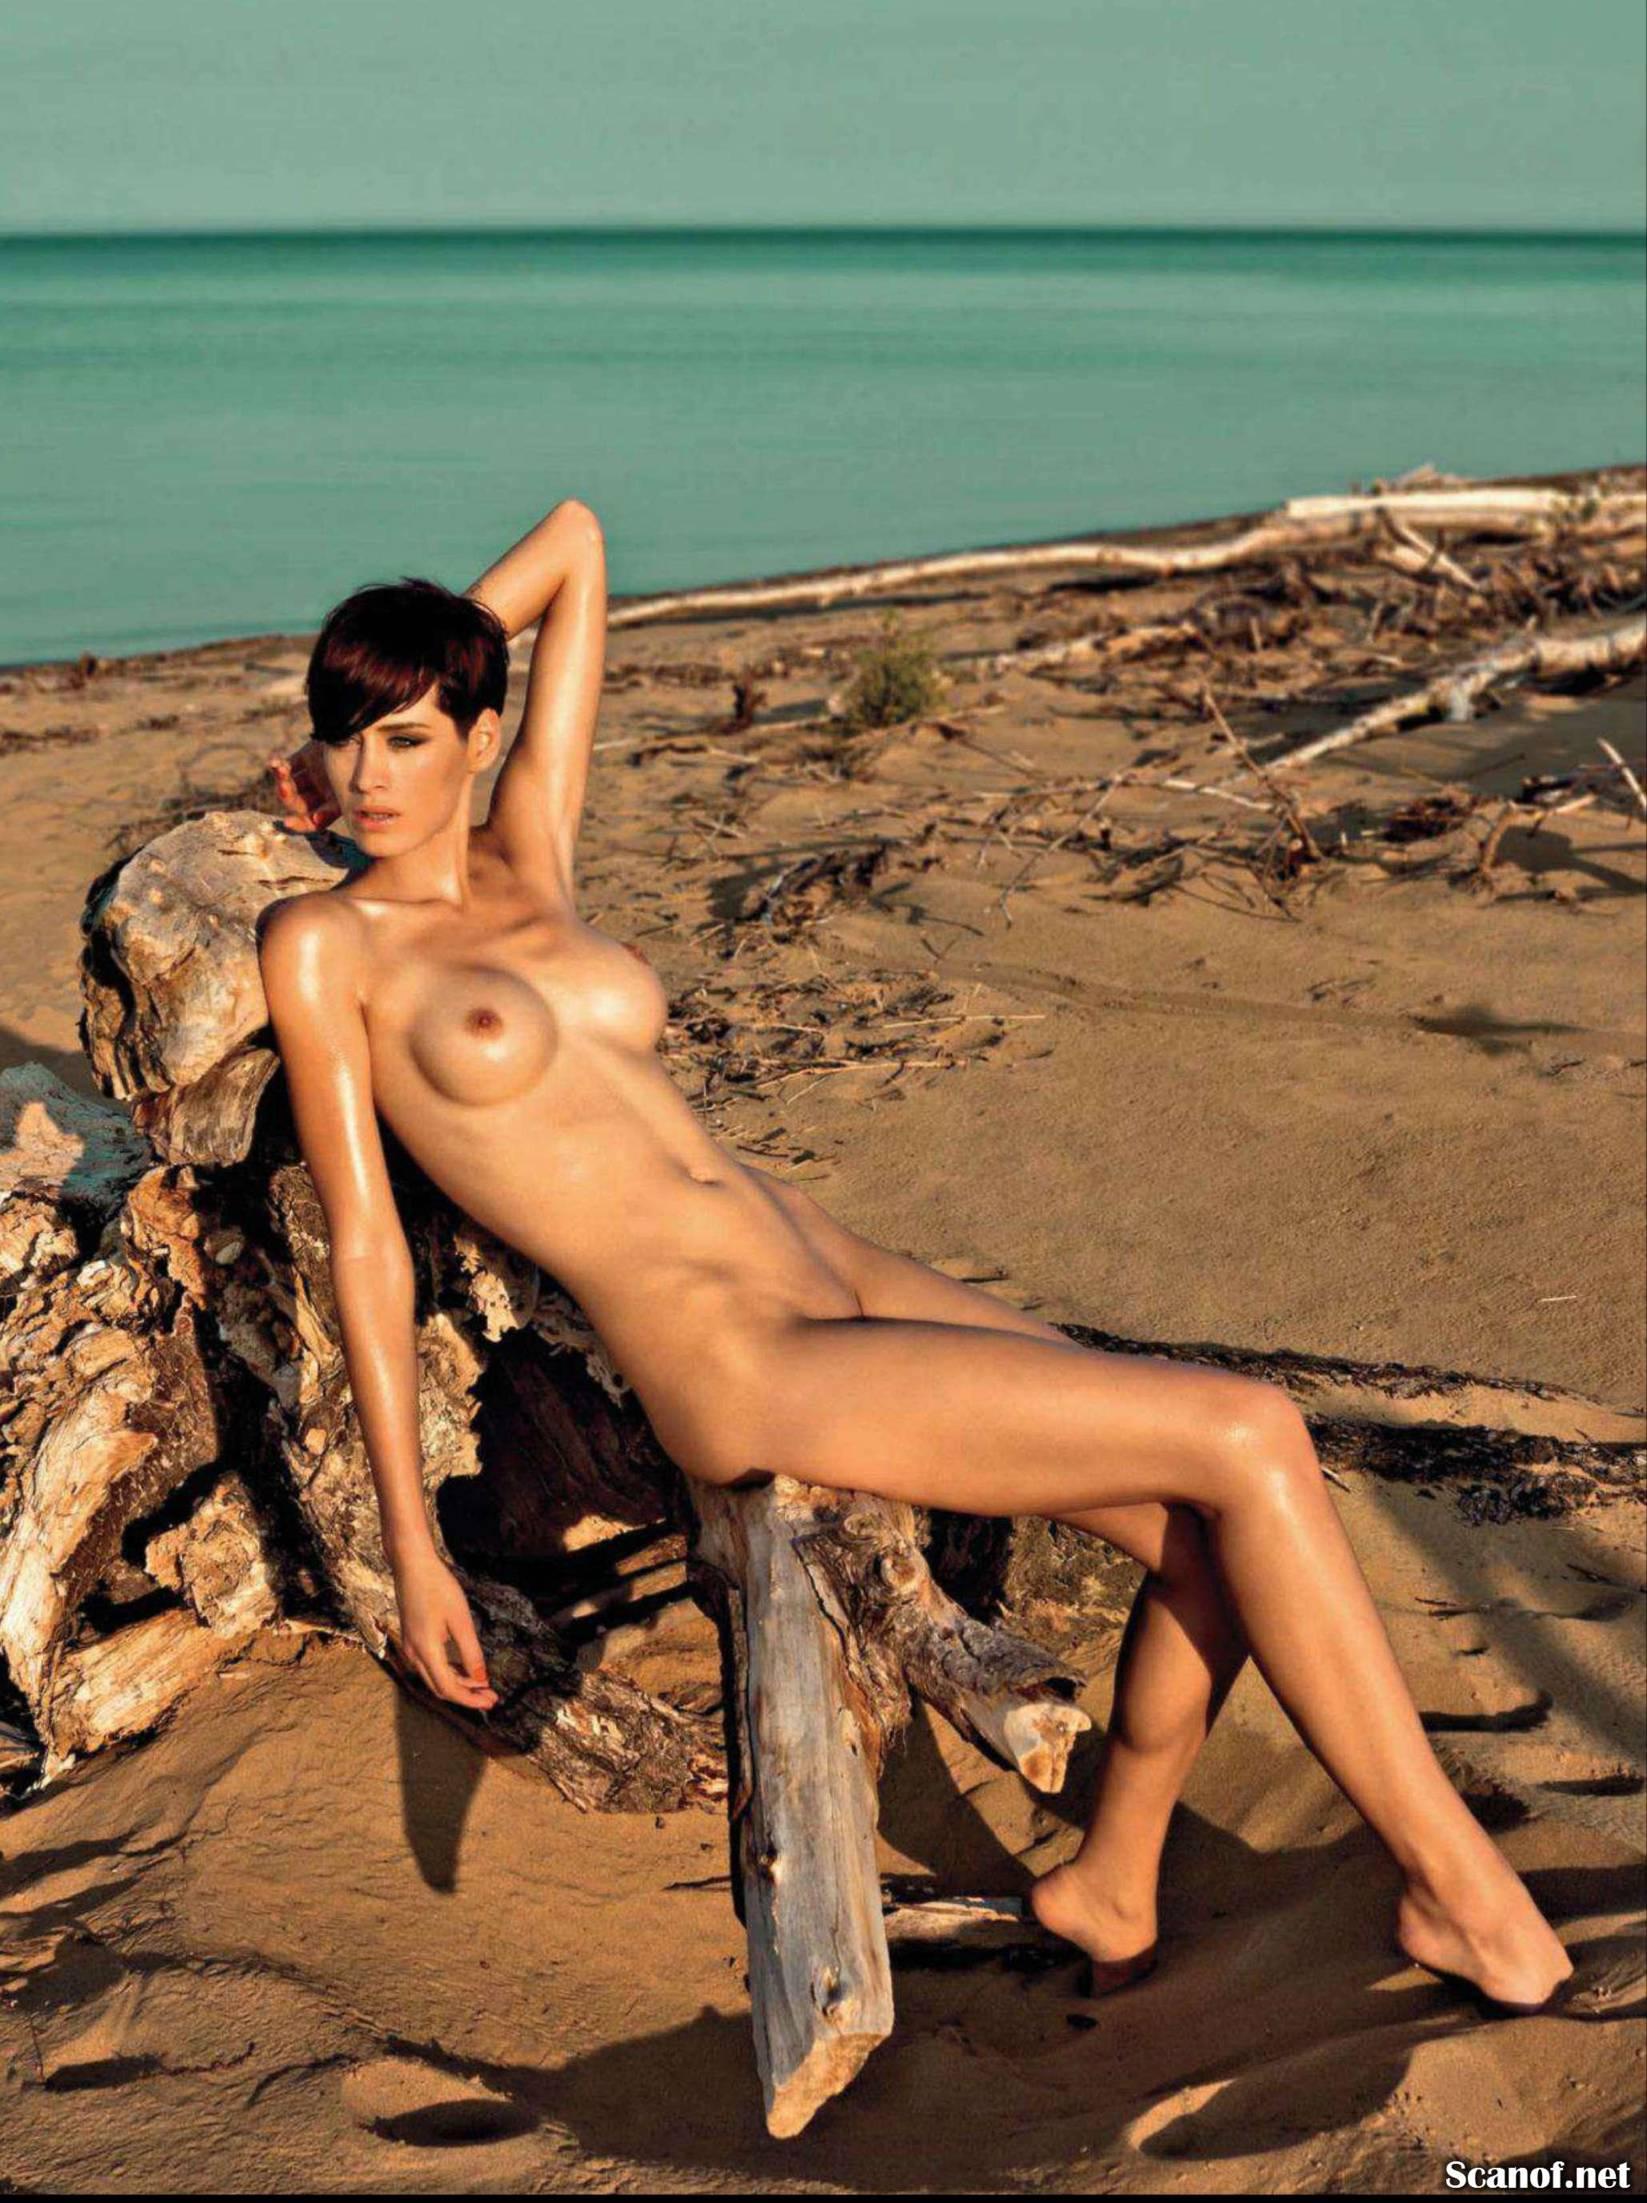 067195921_Playboy_2013_07_Slovenia_Scanof.net_043_123_1lo.jpg